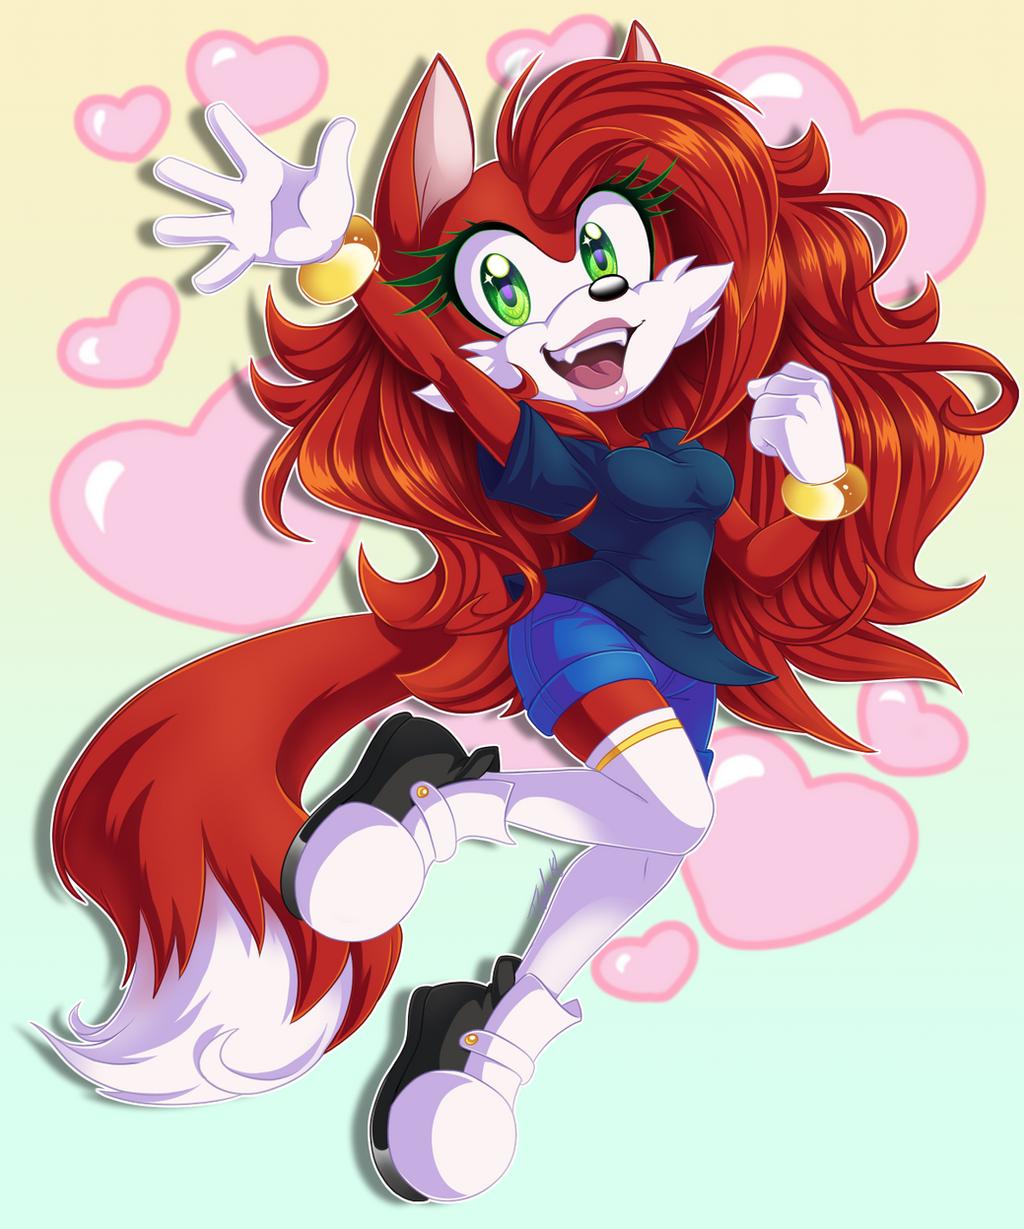 Eva the Fox by MetalPandora